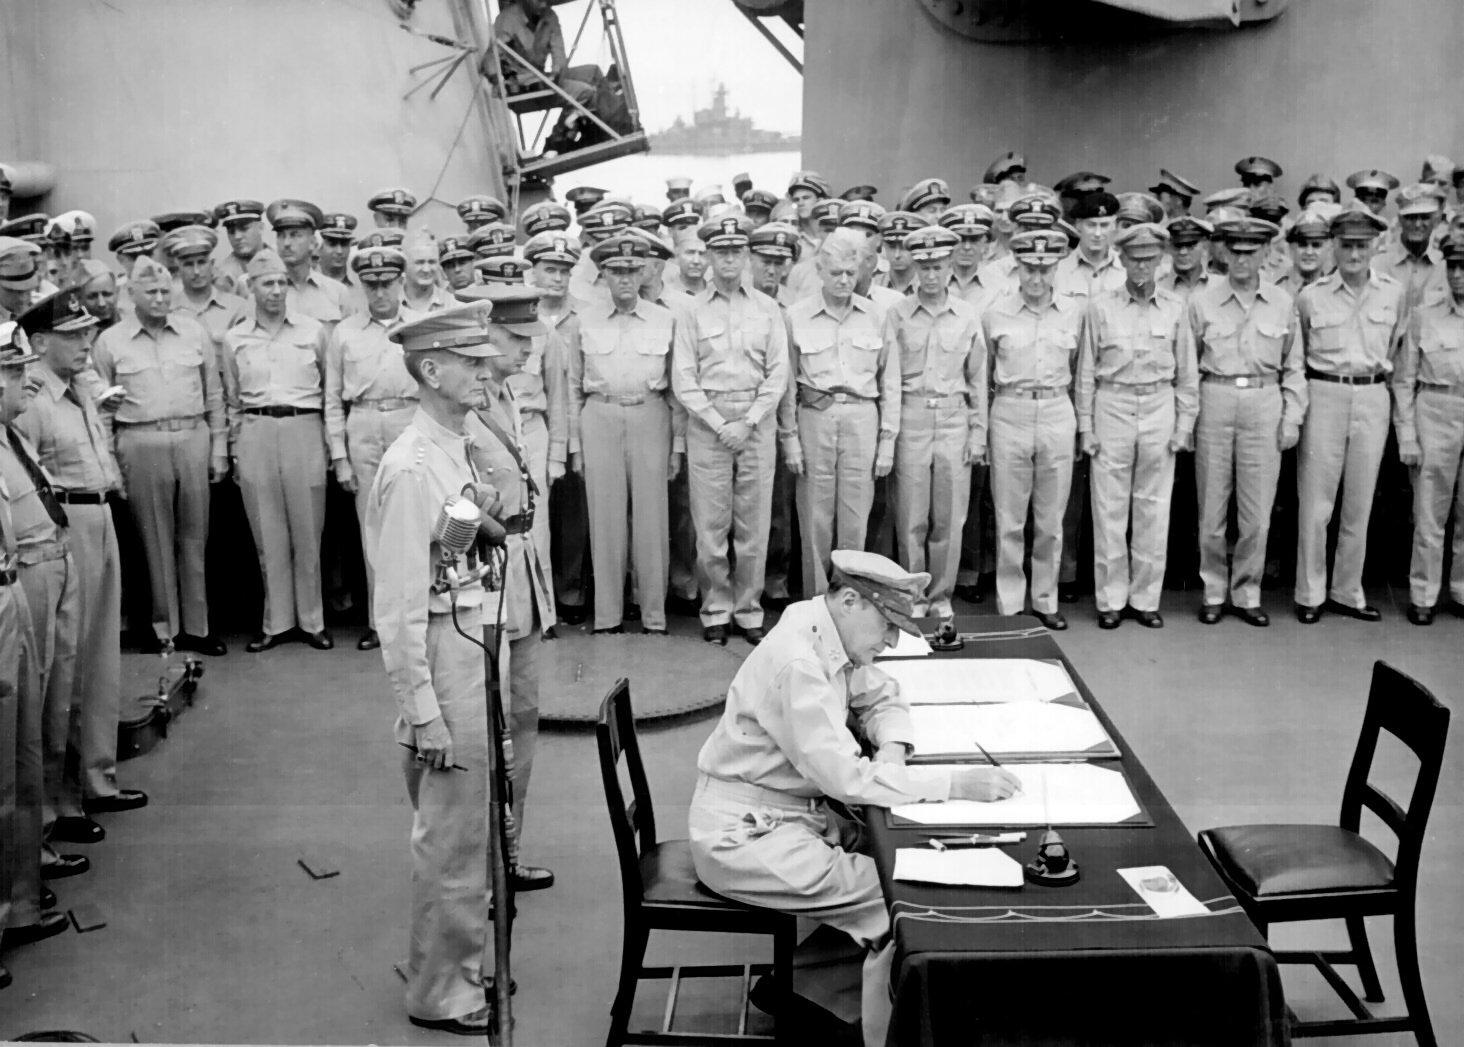 General Douglas MacArthur signs Japanese surrender instrument as Supreme Allied Commander during formal surrender ceremonies on the USS Missouri in Tokyo Bay on September 2, 1945. Behind General MacArthur are U.S. Lieutenant General Jonathan Wainwright and British Lieutenant General Arthur E. Percival.